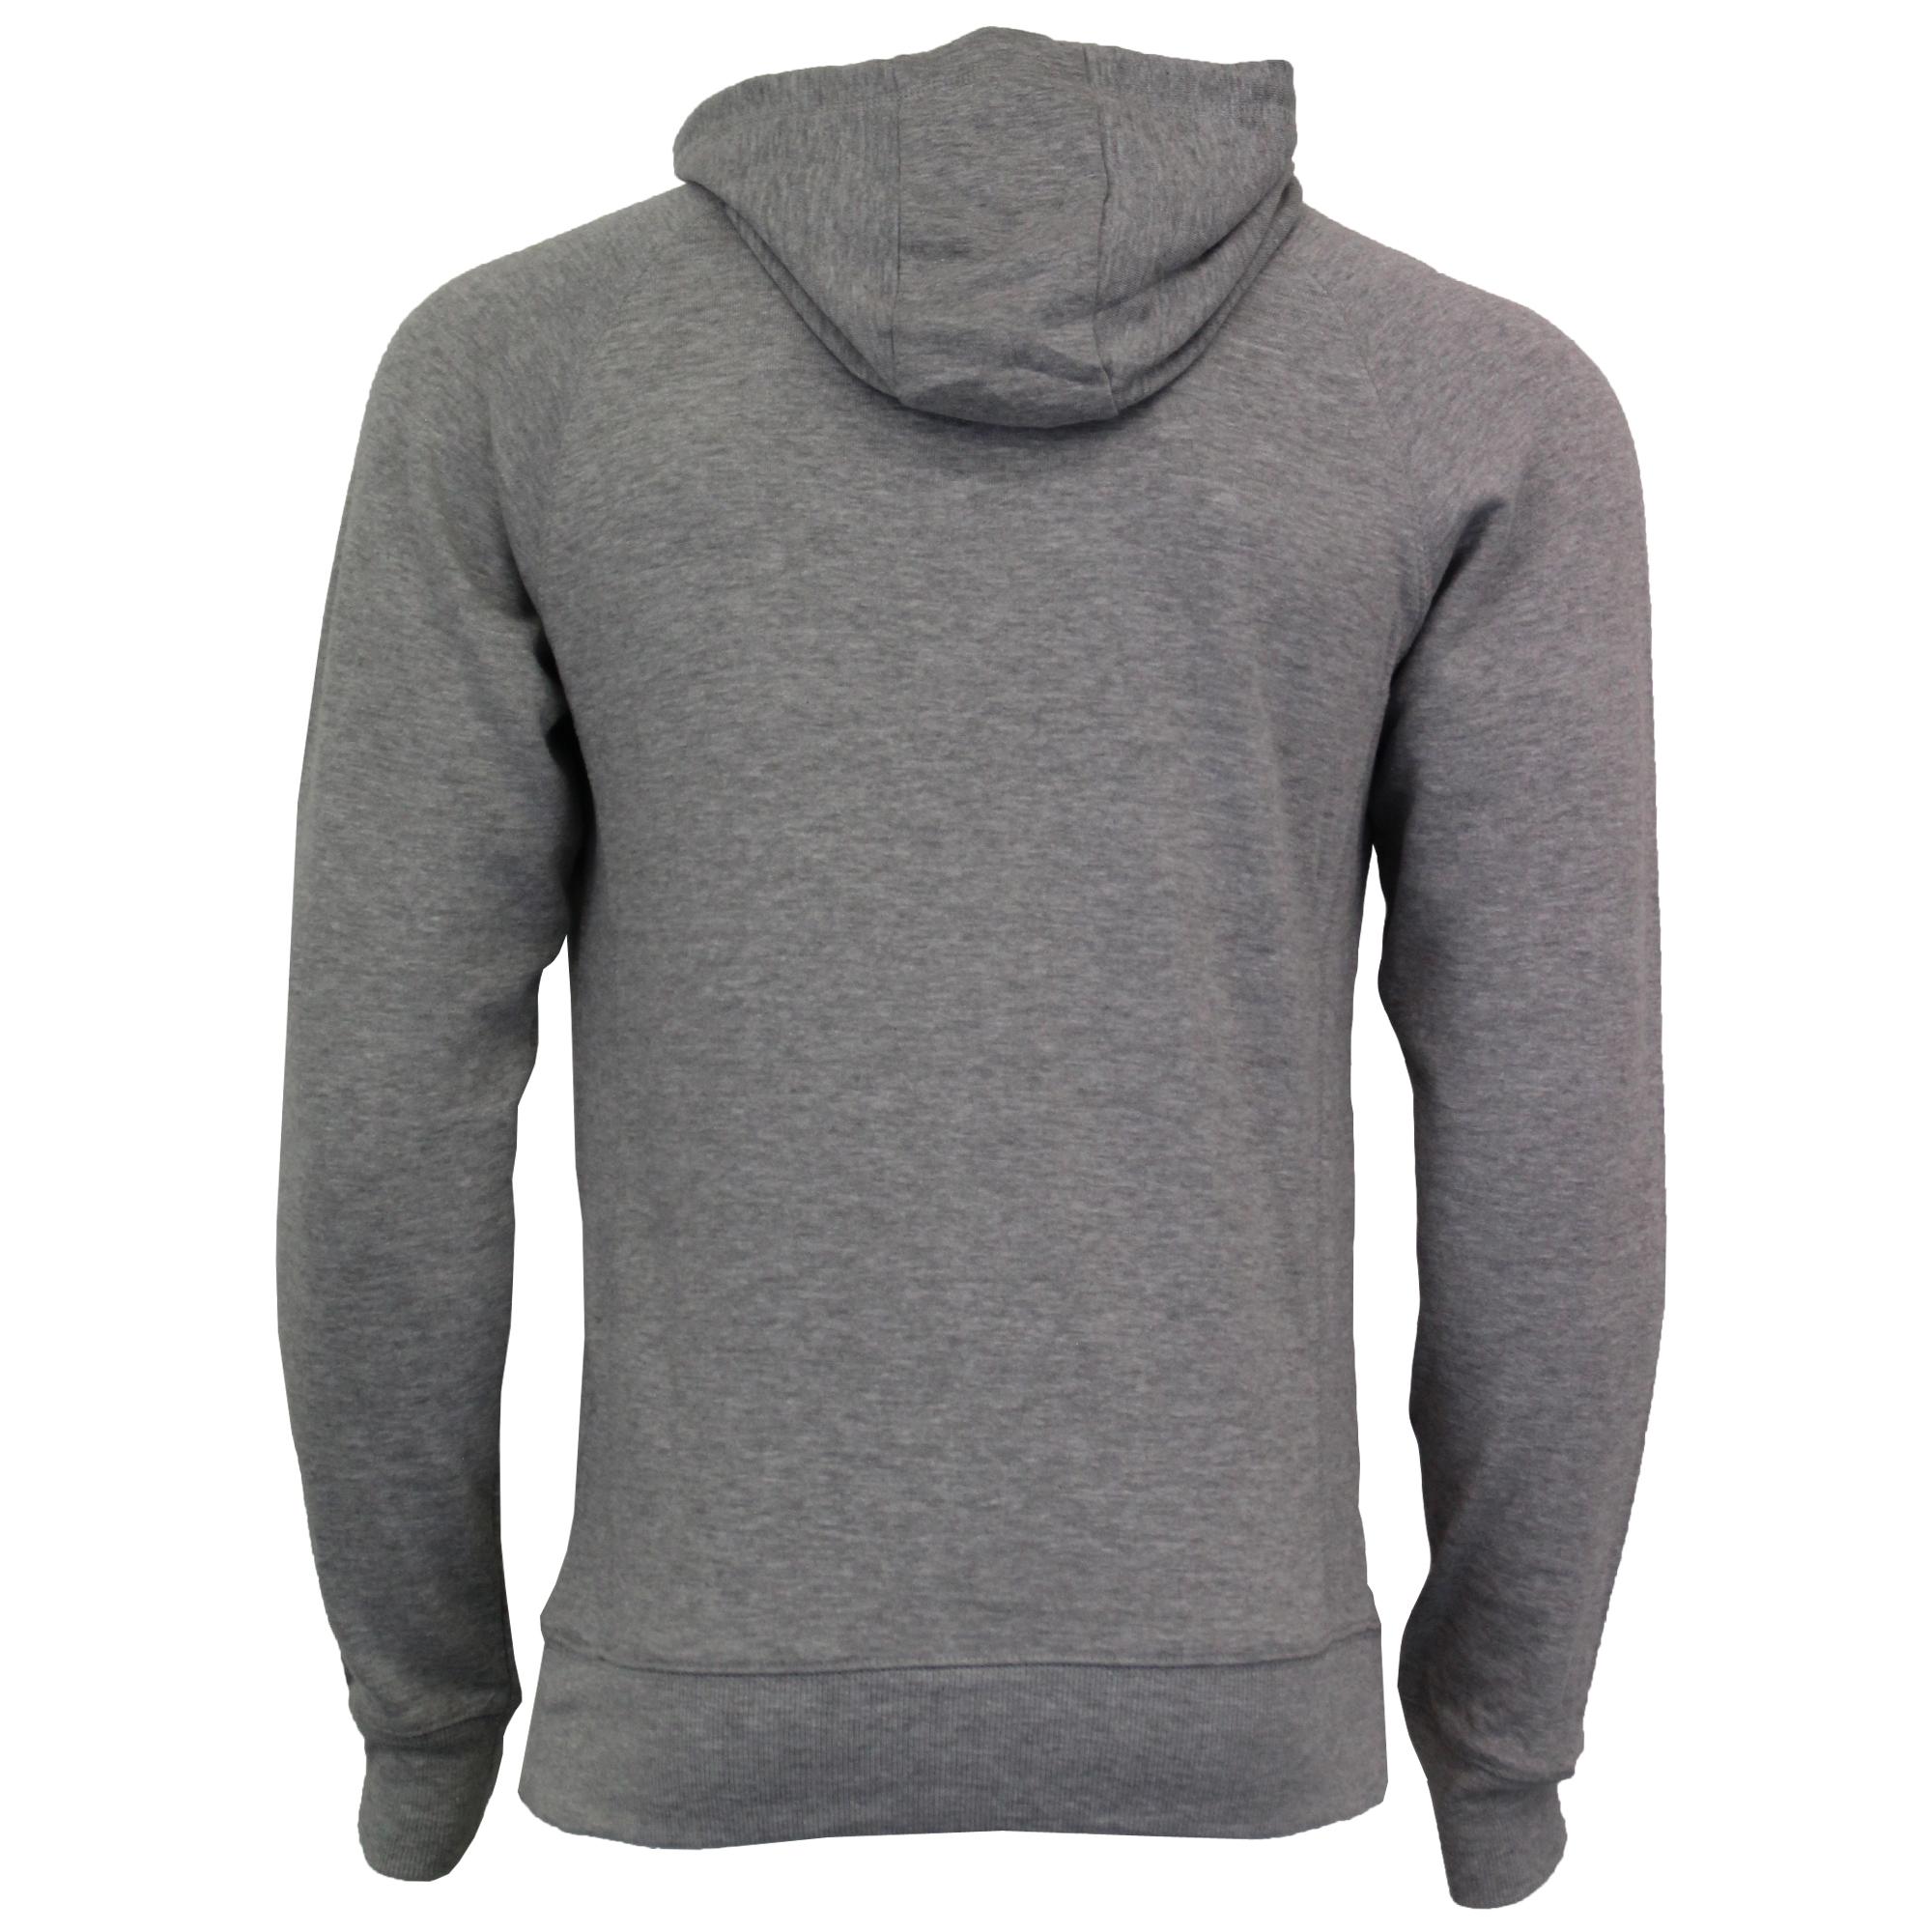 Mens Sweatshirt Tokyo Laundry Hoodie Top Pullover Print Fleece Lined BUSHWICK